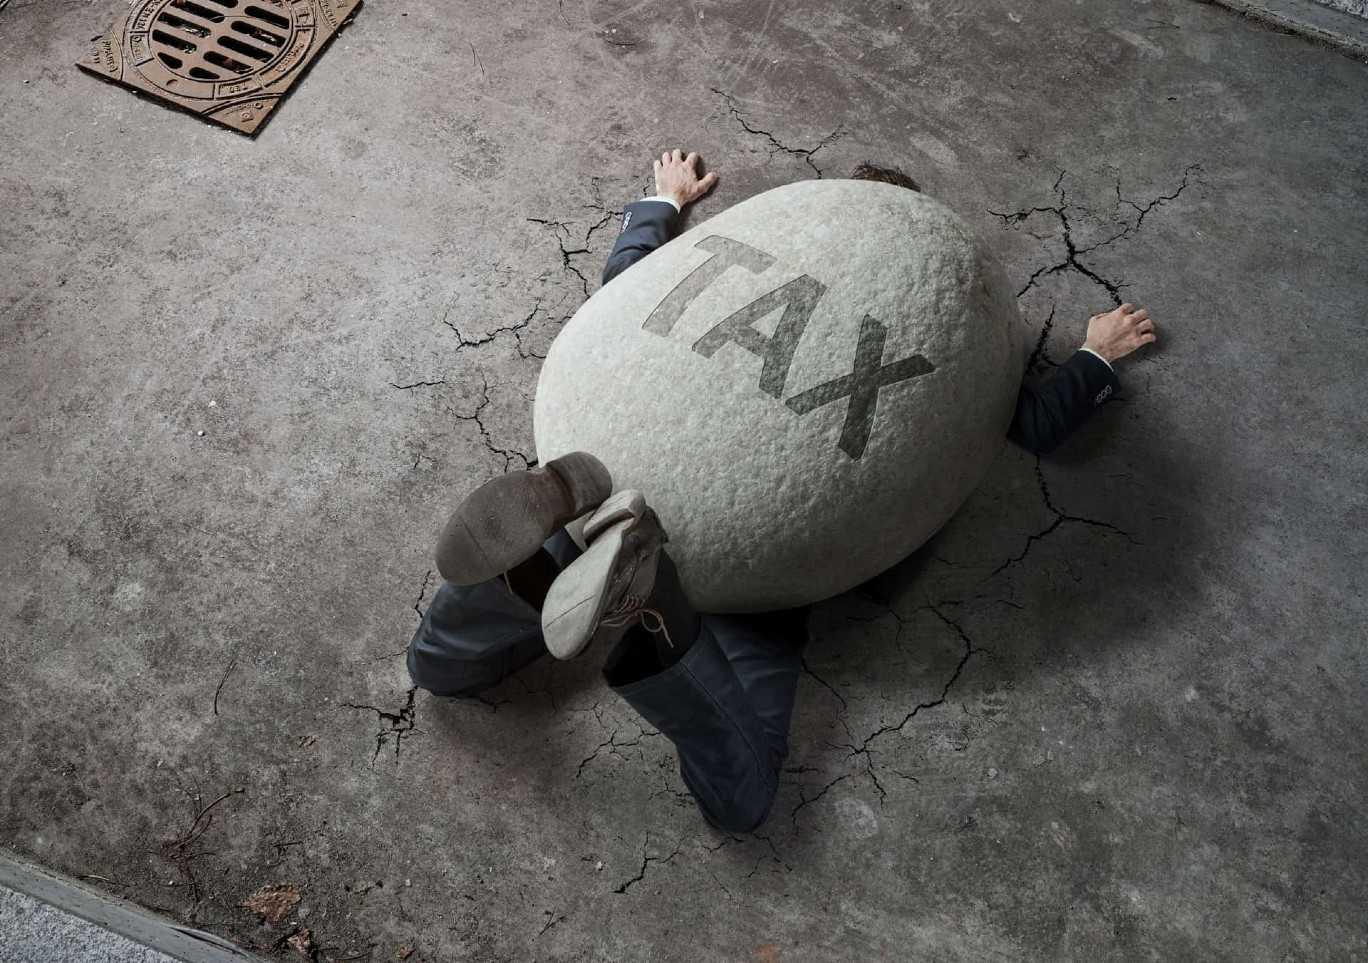 Stone Weight Tax Crushes Man